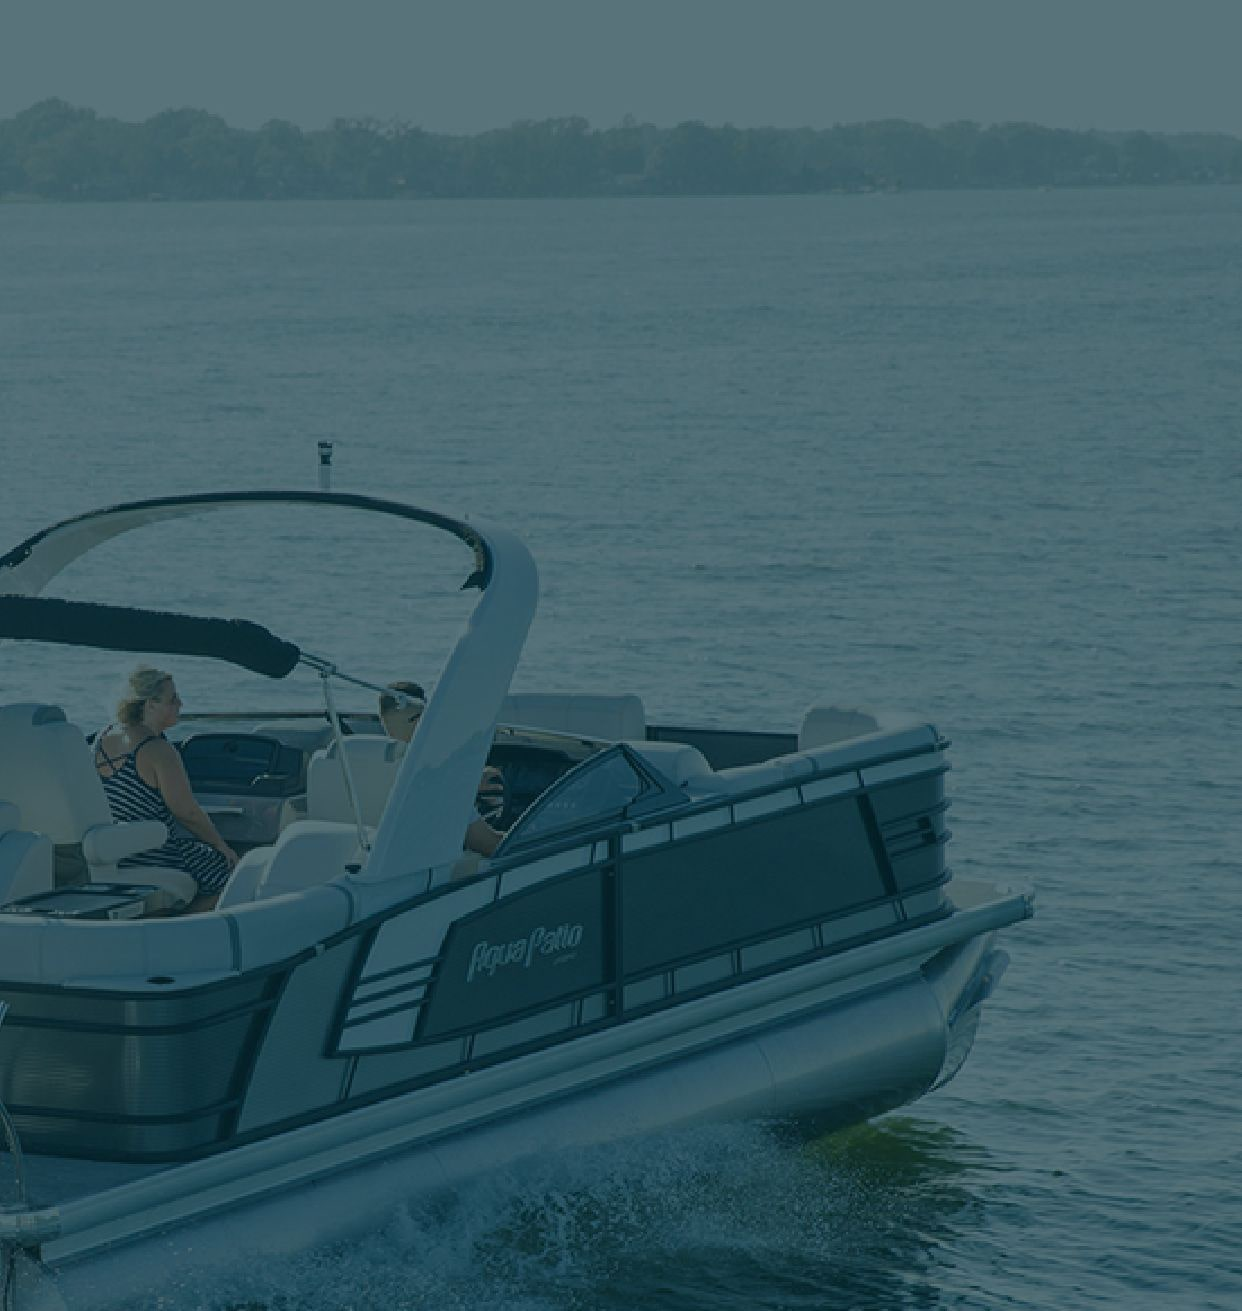 Home Boat City Marine Portage Mi 269 327 3008